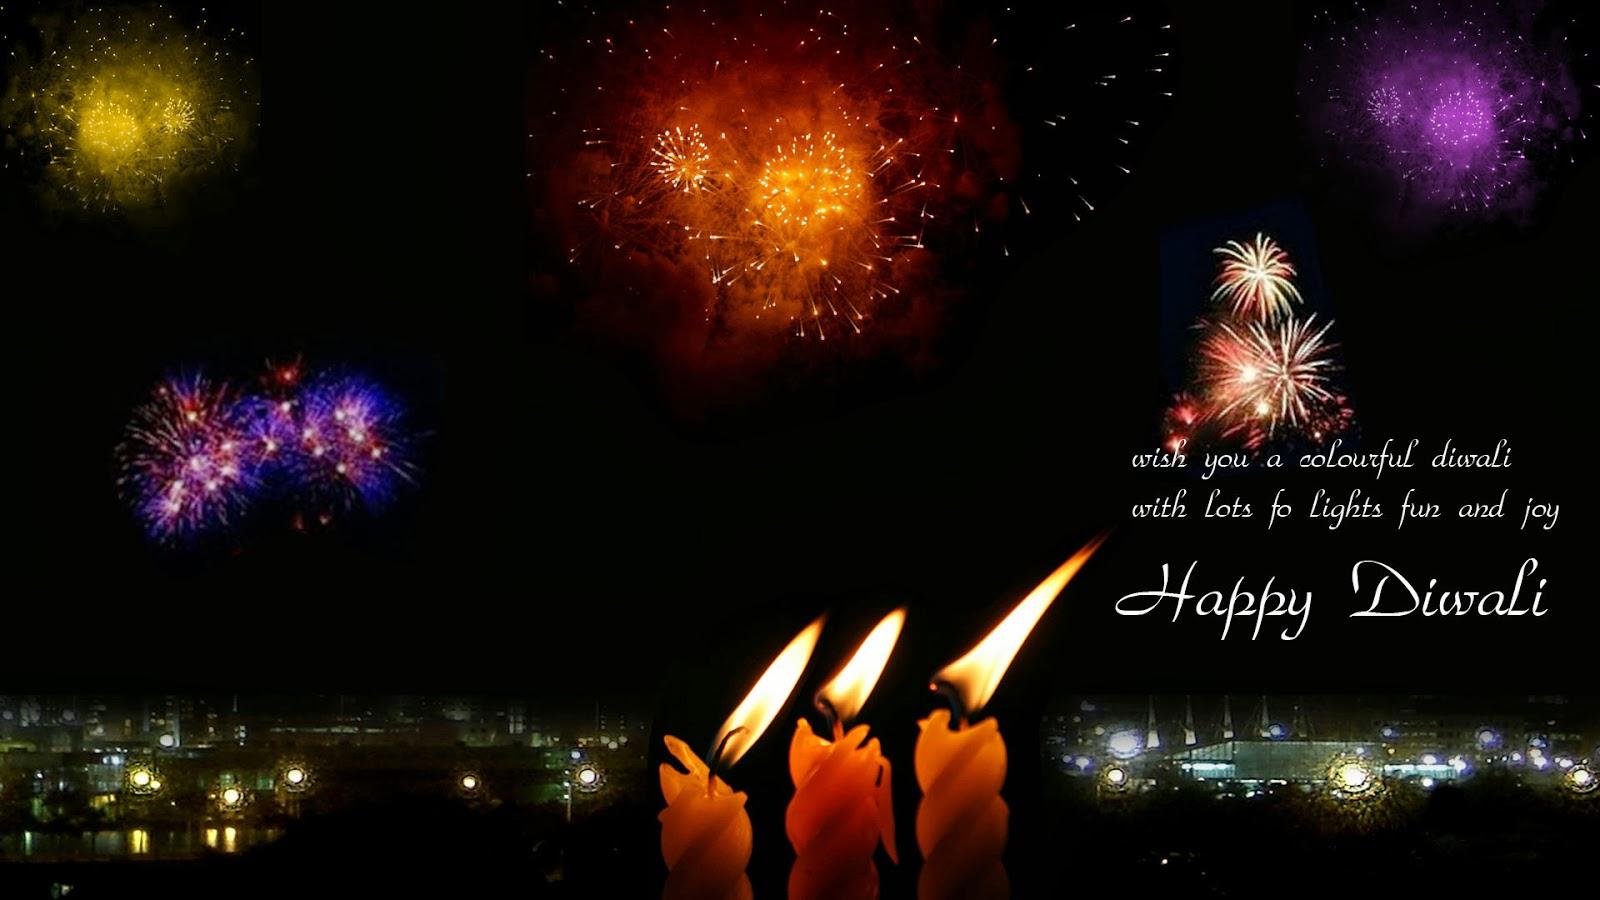 Happy Diwali Marathi Greetings Great Happy Diwali In Advance Image